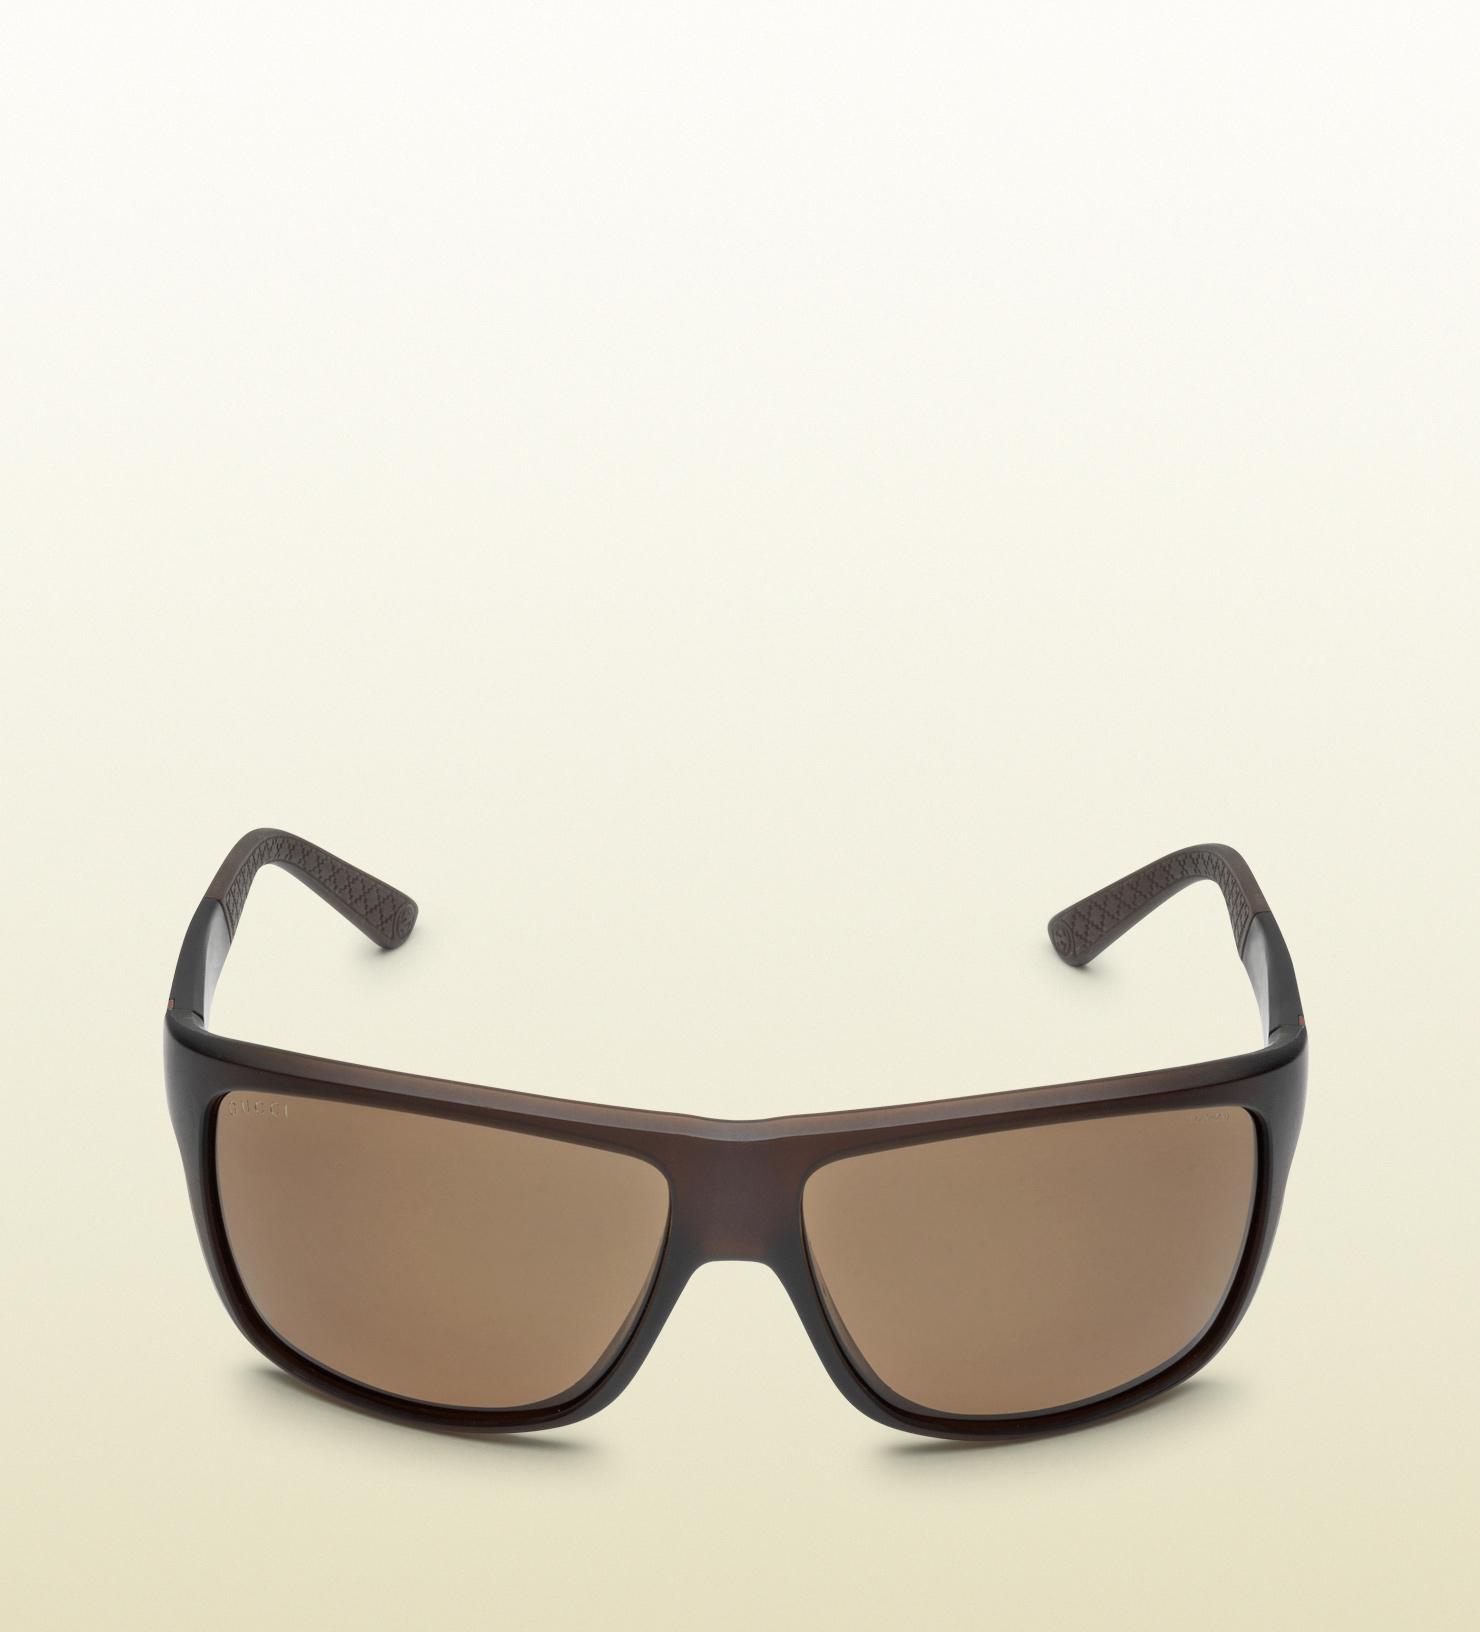 5c1a8c41baa Lyst - Gucci Mens Sporty Matt Brown Sunglasses in Brown for Men